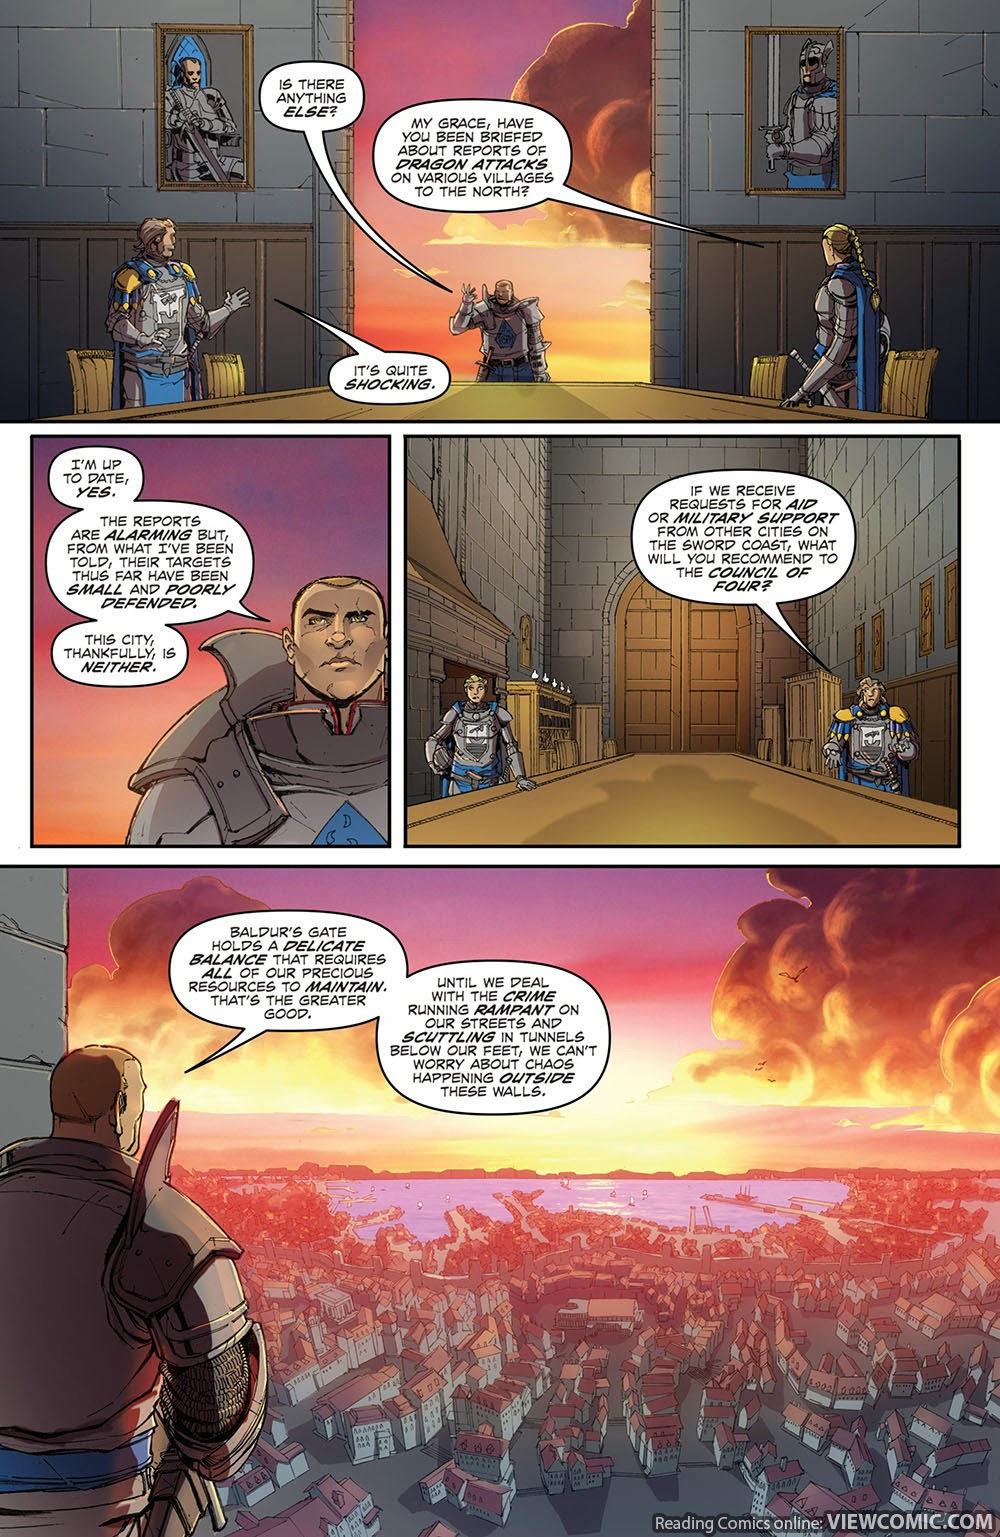 Dungeons & Dragons Legends of Baldur's Gate 002 (2014) | Viewcomic